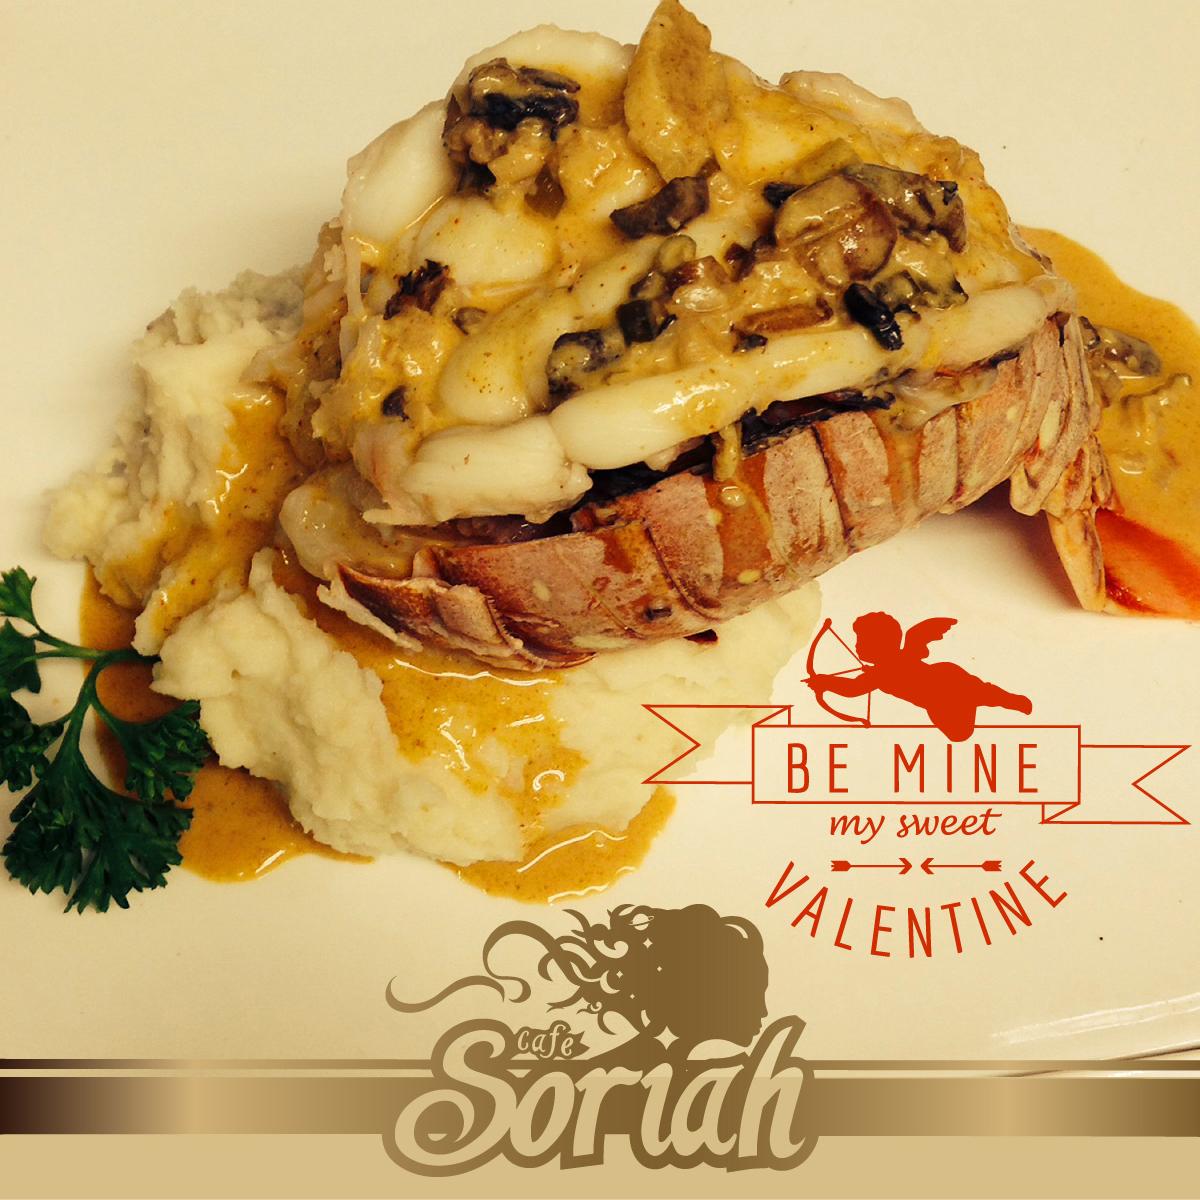 Valentine Gift Certs_Cafe Soriahs-postcard1_v1.jpg